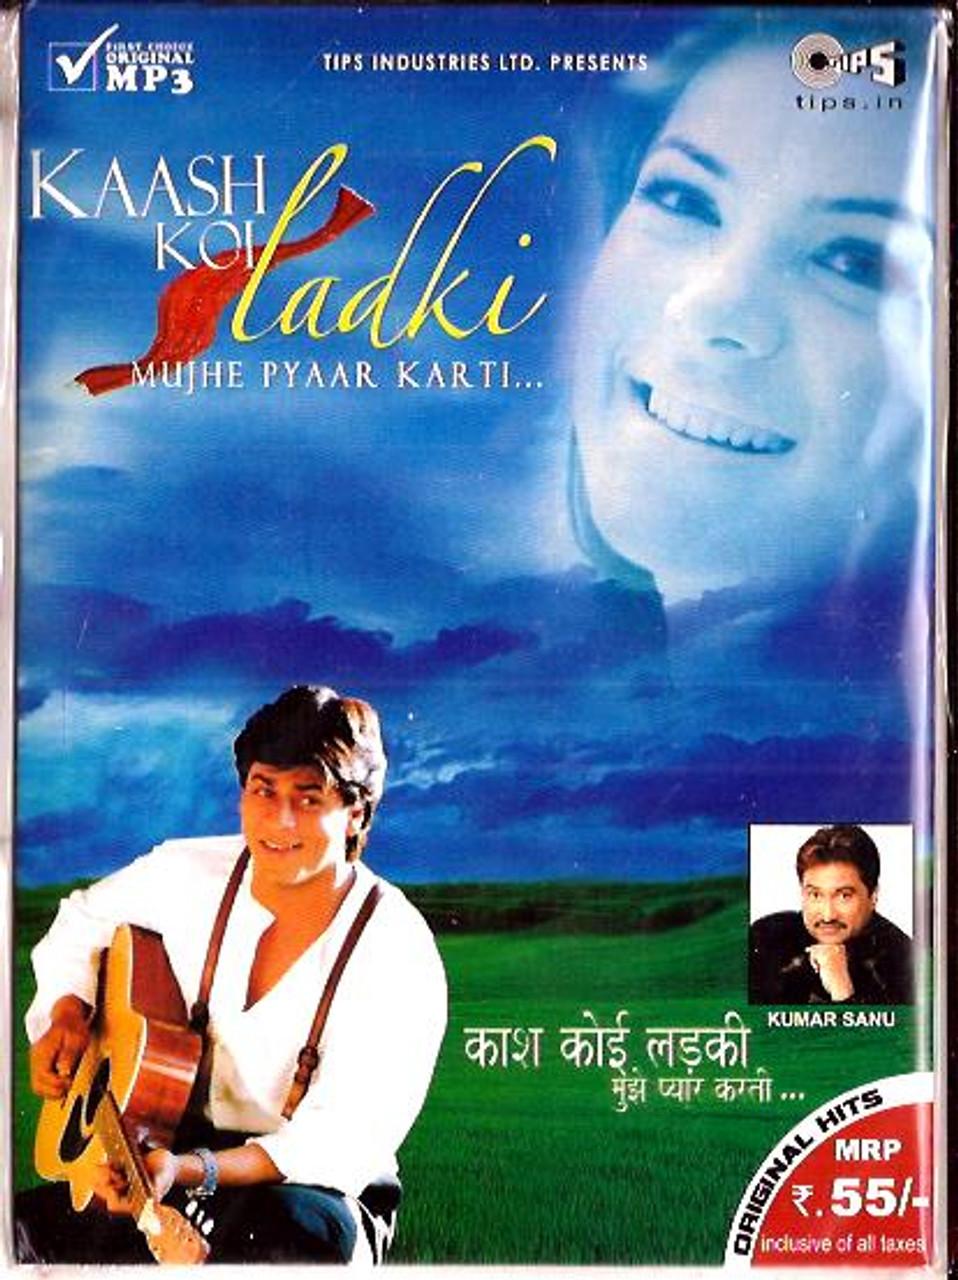 Kaash Koi Ladki Mujhe Pyaar Karti-Kumar Sanu-MP3 36 Songs